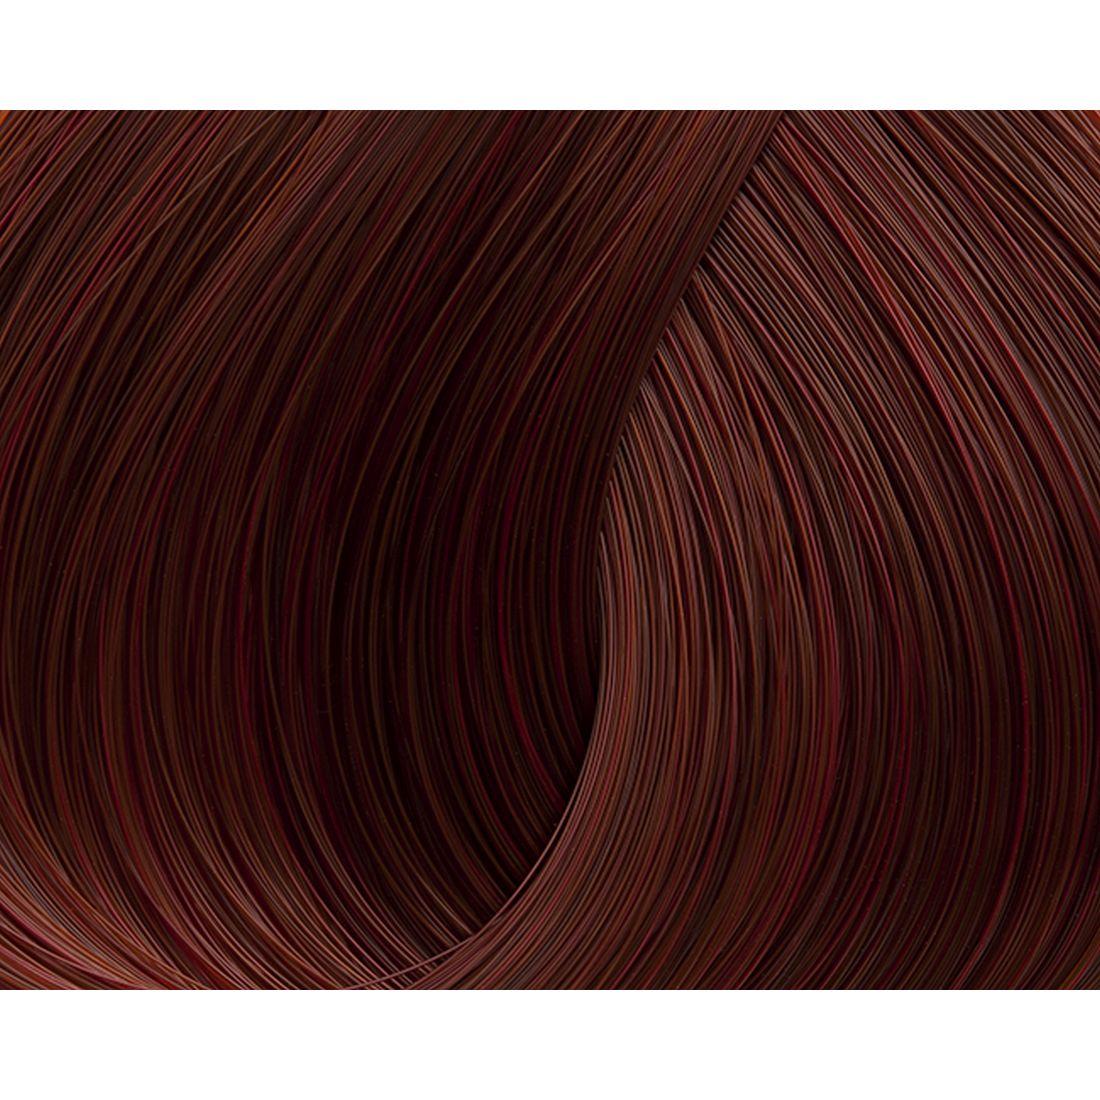 Lorvenn Beauty Color Επαγγελματική Βαφή Σωληνάριο 70ml No 6.65 Supreme Red-Ξανθό Σκούρο Κόκκινο Ακαζού No 6.65 Supreme Red-Ξανθό Σκούρο Κόκκινο Ακαζού